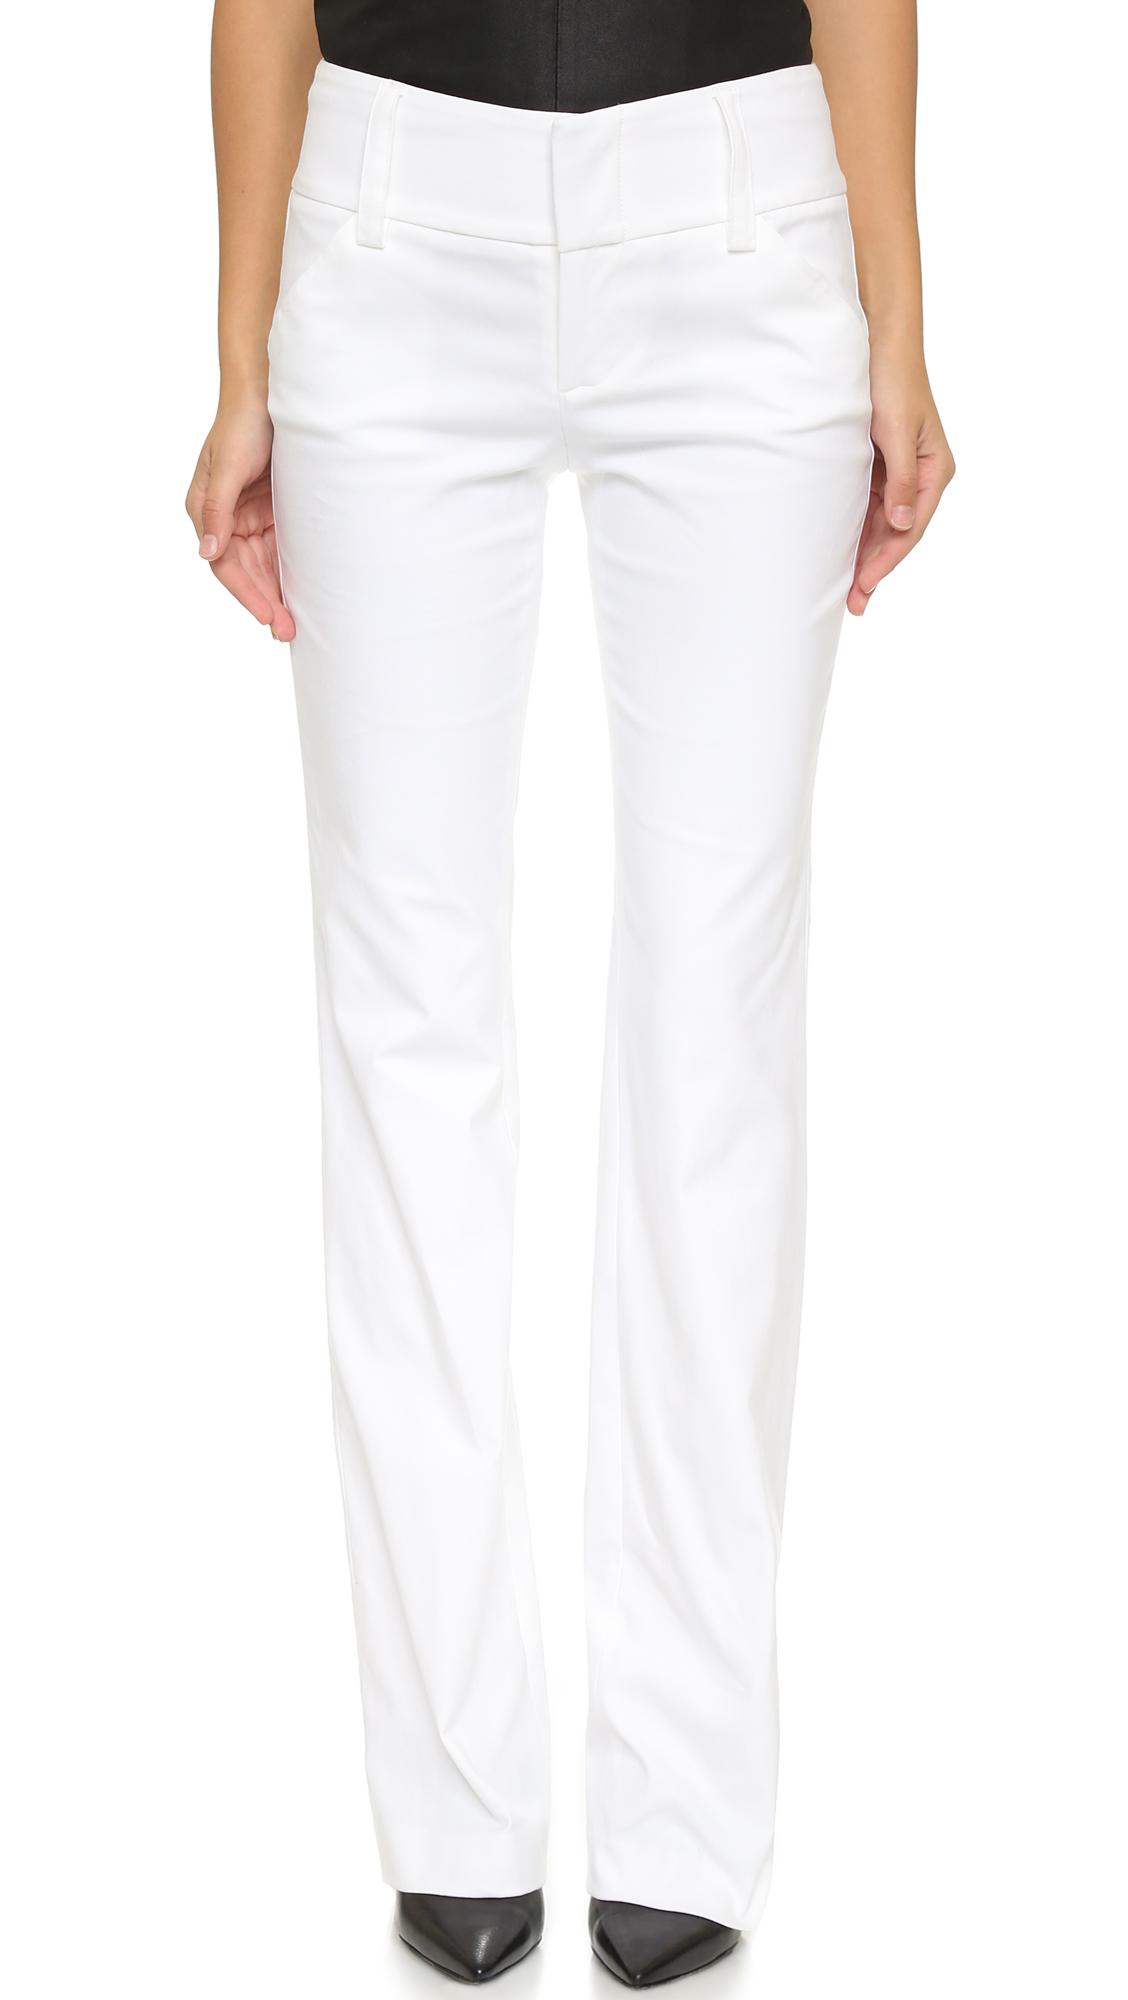 Alice + Olivia Olivia Wide Waistband Pants - White at Shopbop